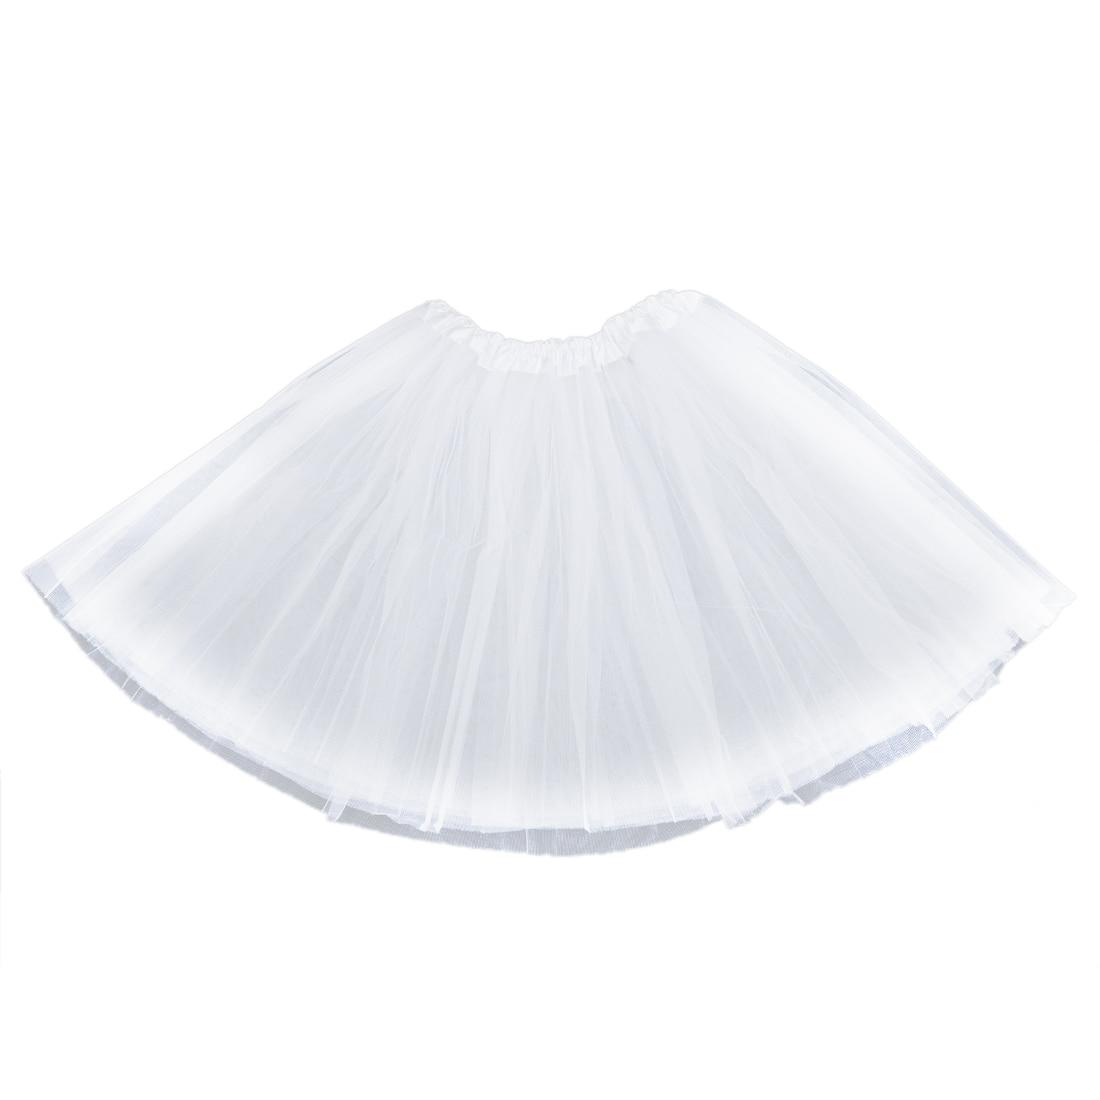 syb-2016-new-women-adult-organza-dance-wear-tutu-font-b-ballet-b-font-pettiskirt-princess-party-skirt-white